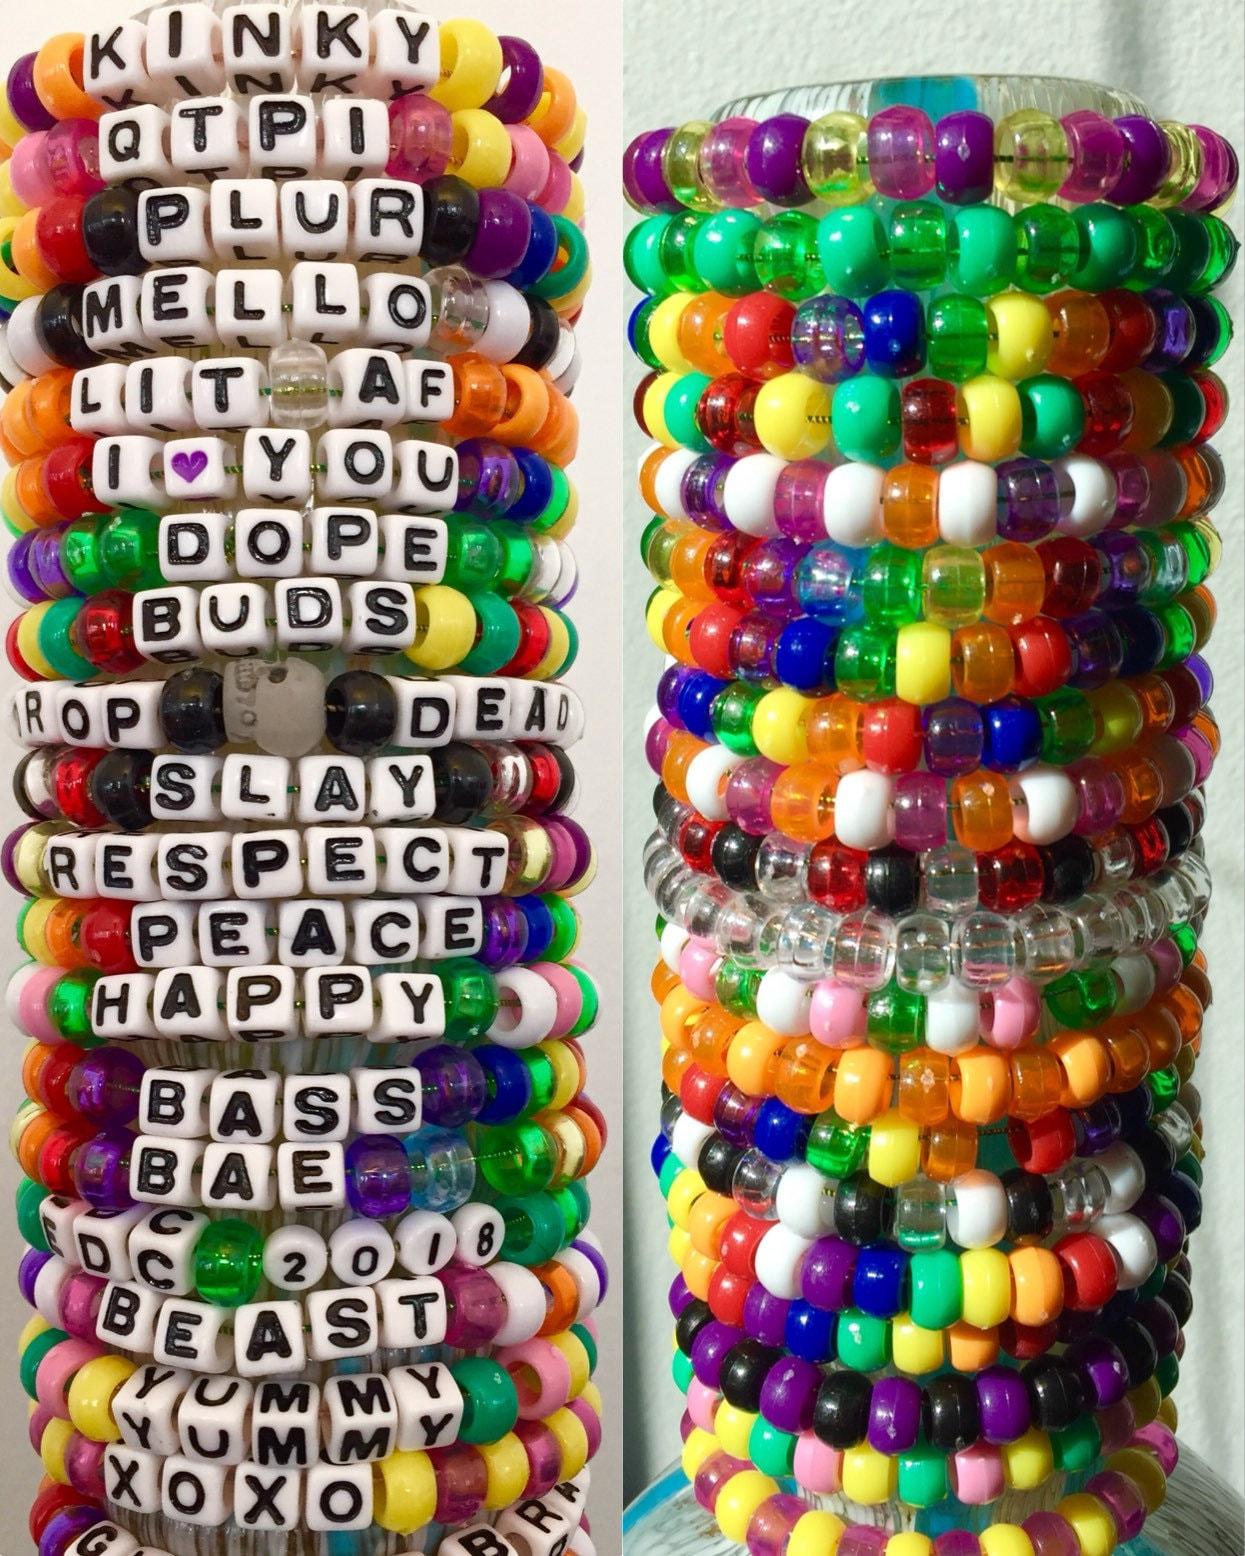 25 Best Images About Kandi On Pinterest: 1 Custom Kandi Bracelet. Pick Colors/phrases. Rave Kandi